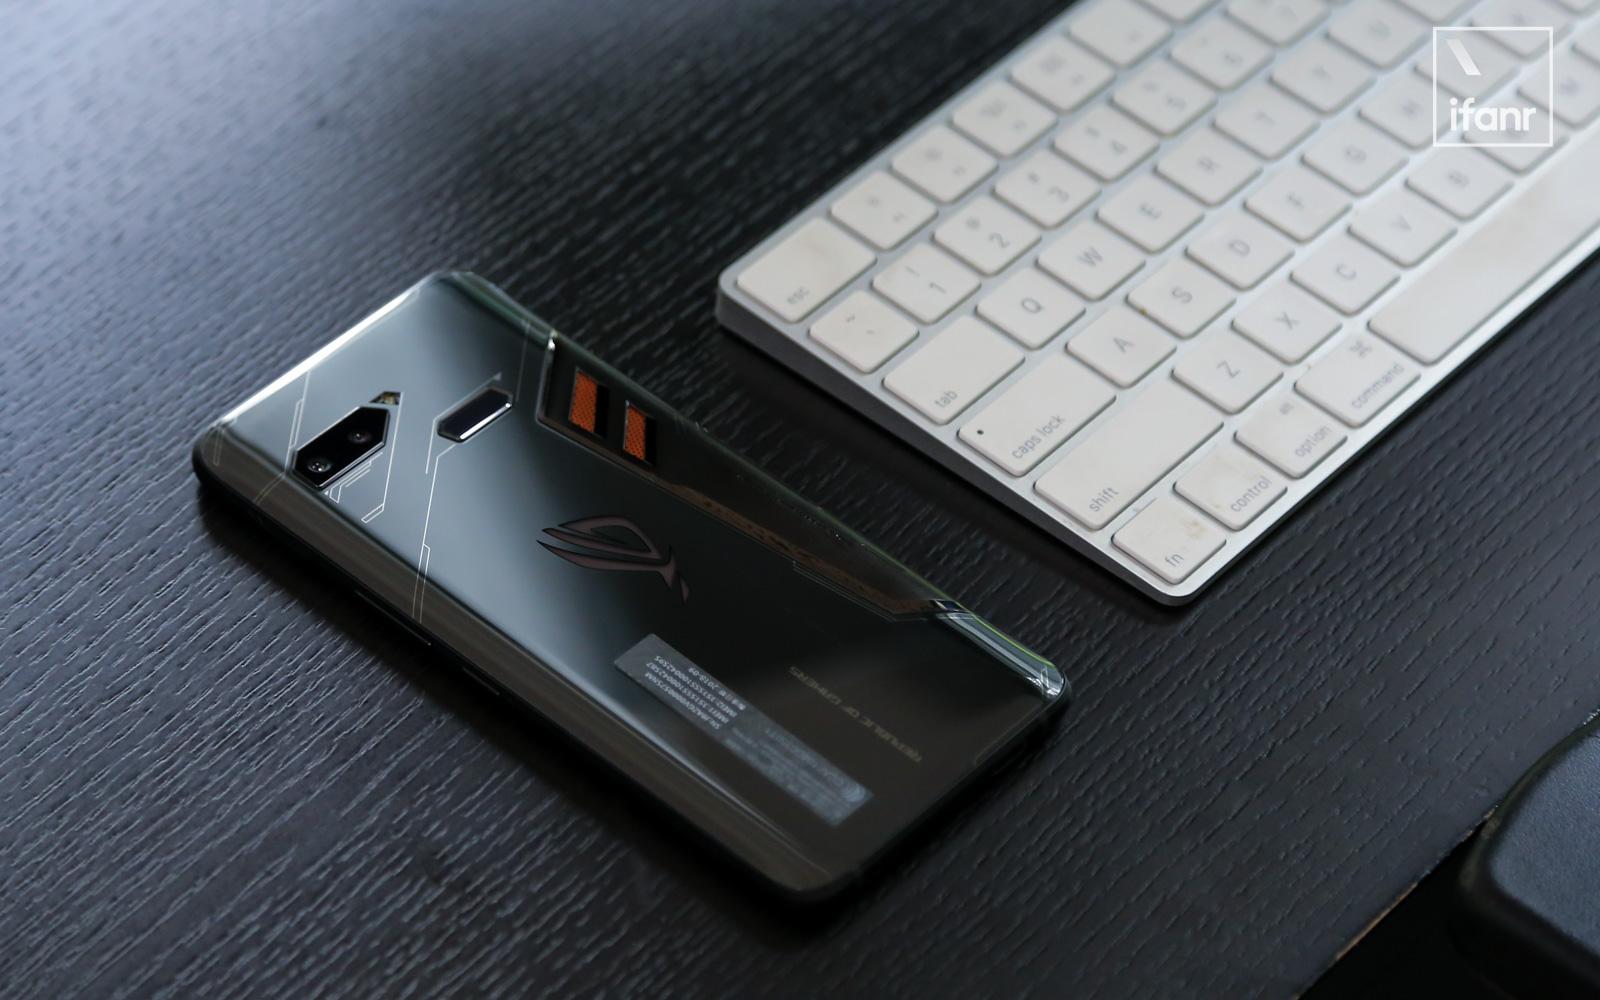 rog phone 评测:一部游戏手机的自我修养